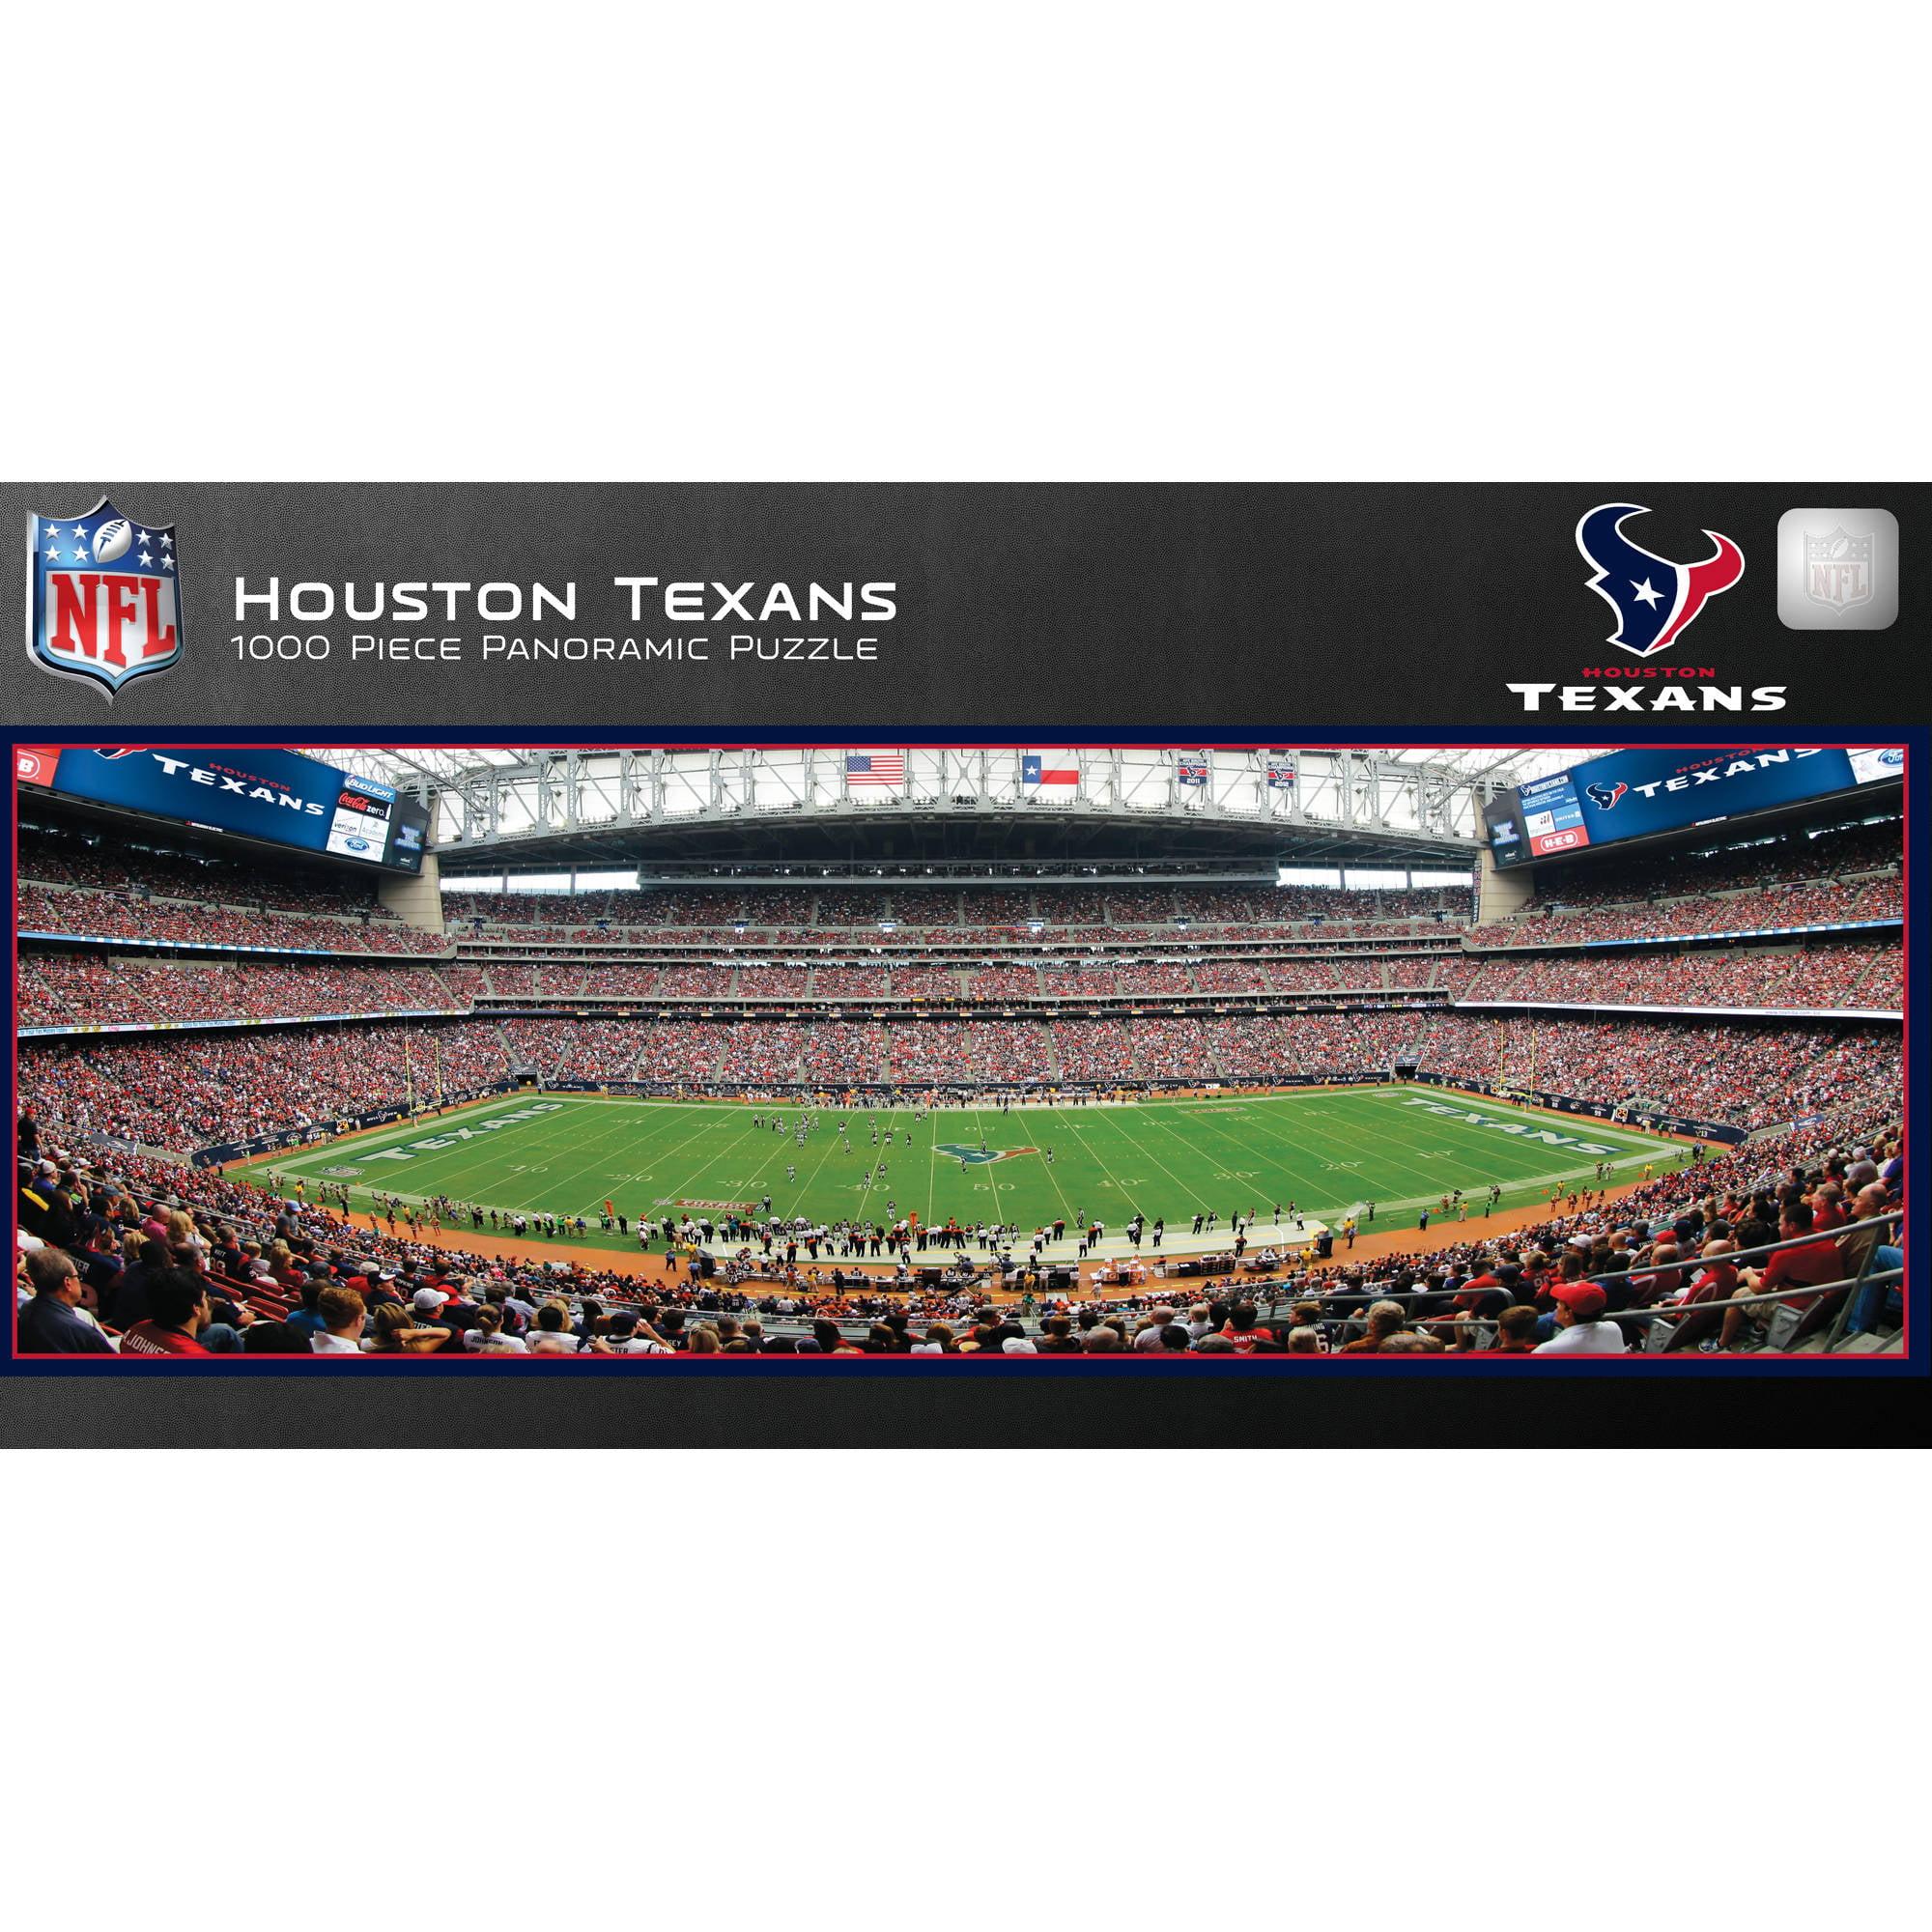 Master Pieces Houston Texans Panoramic Stadium Puzzle, 1,000 Pieces by Generic